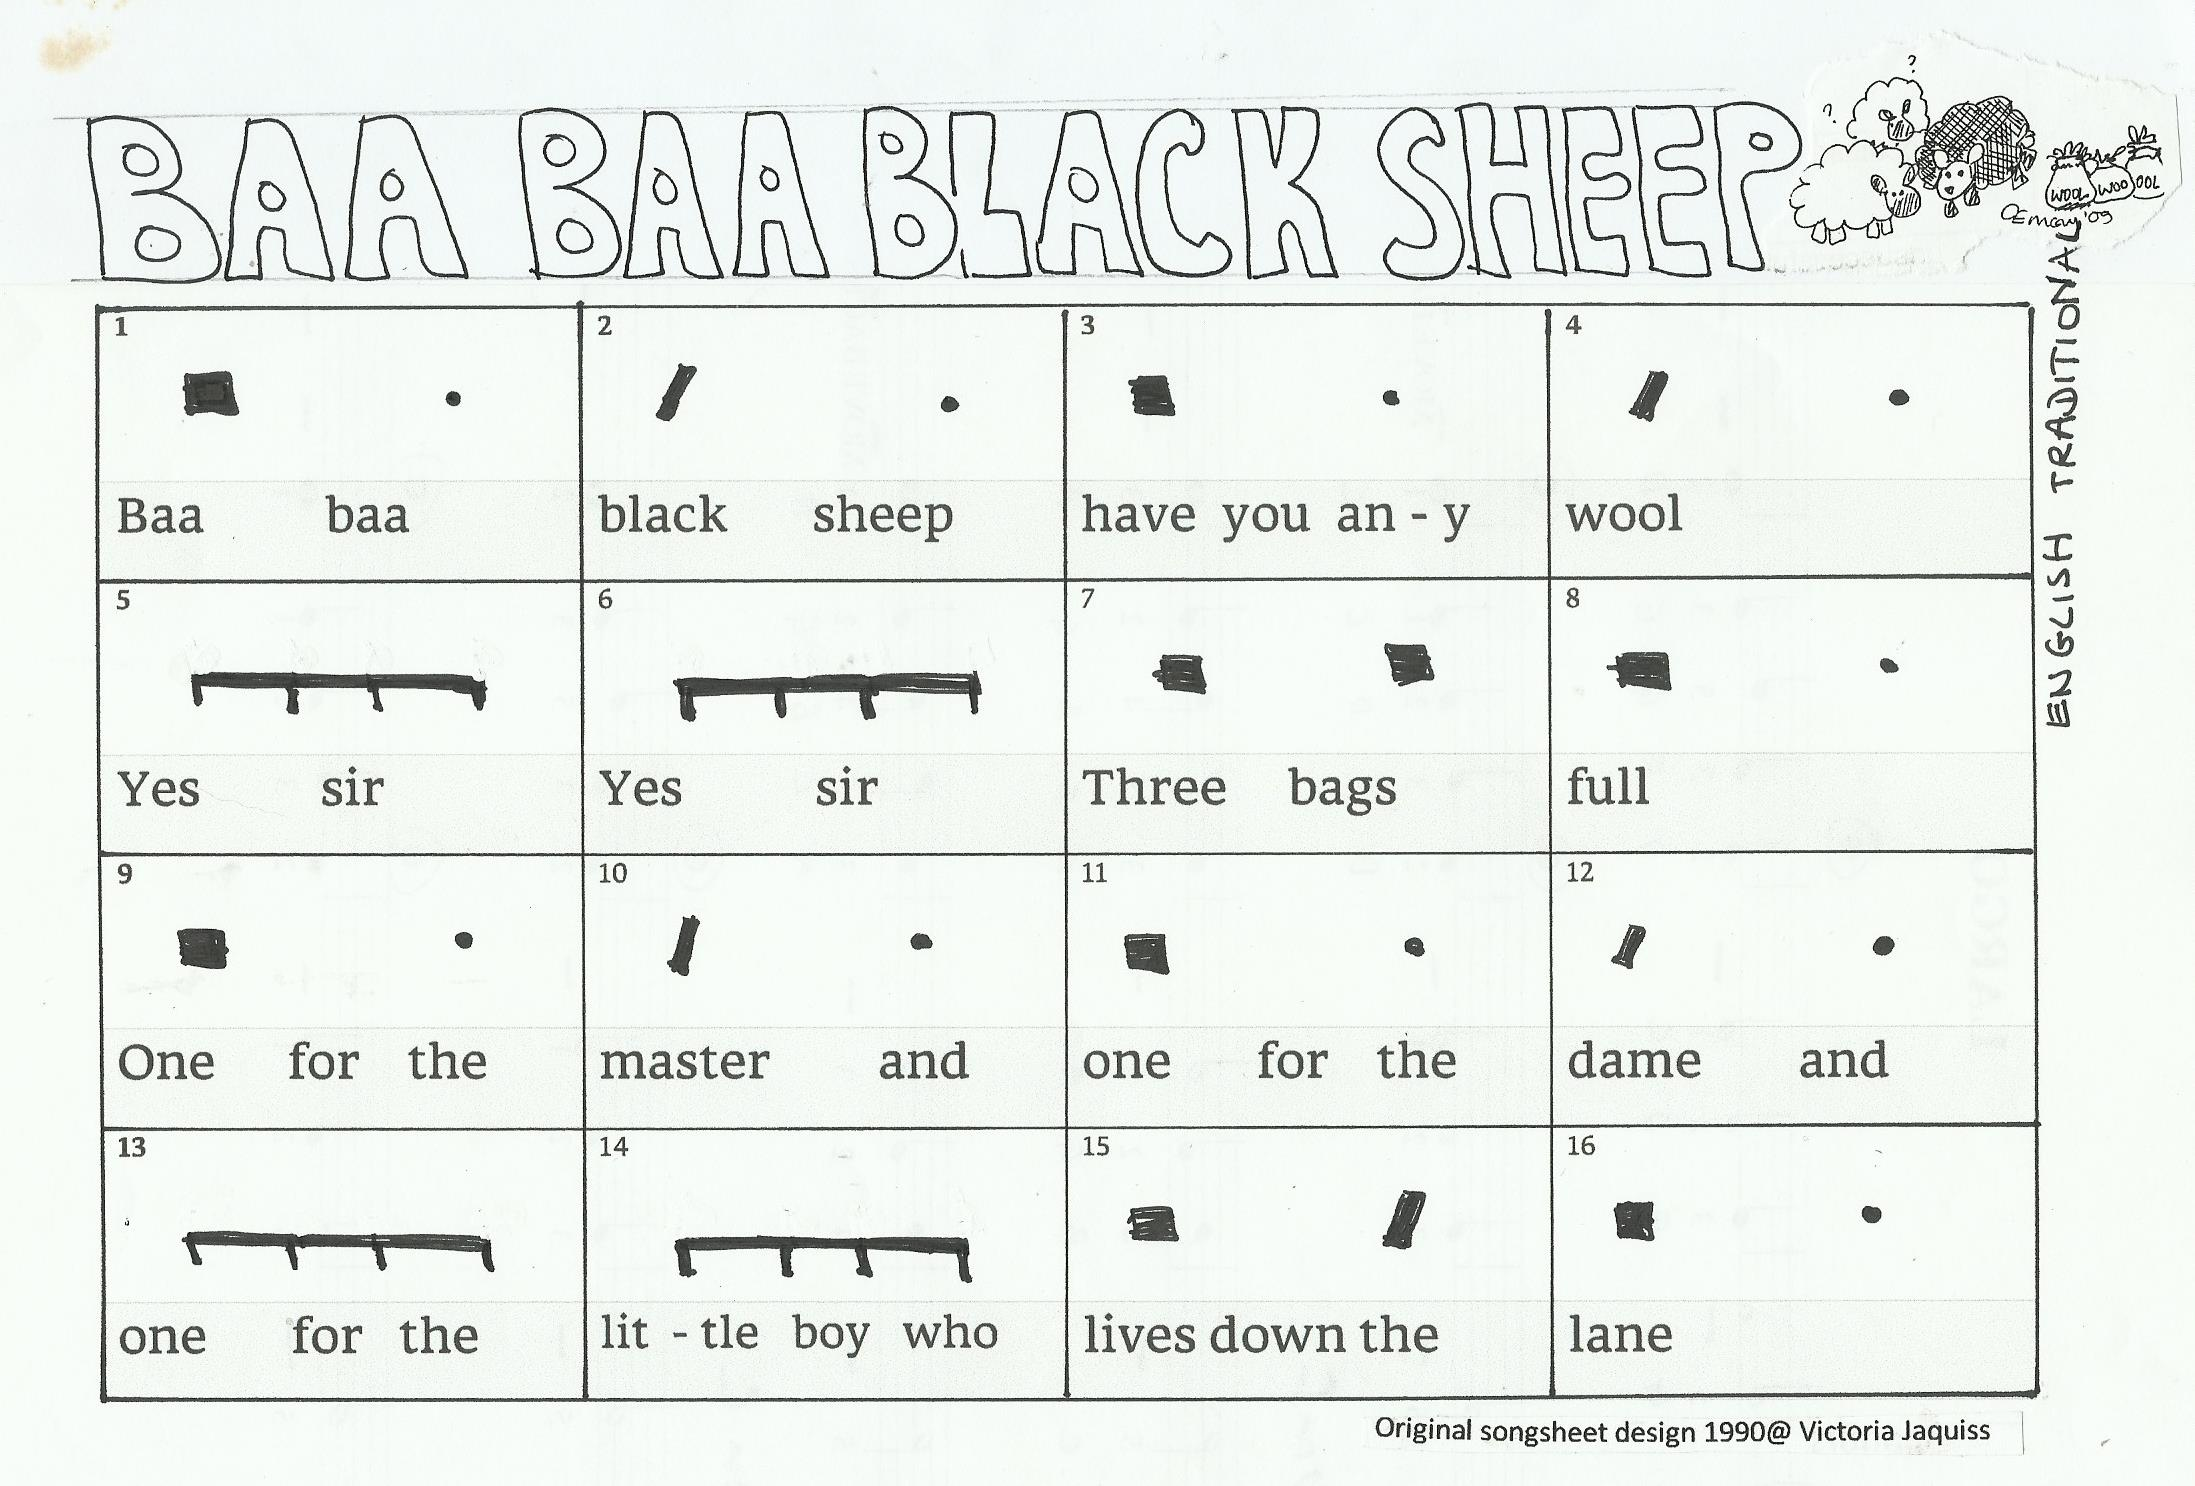 Baa Baa Black Sheep with percussion